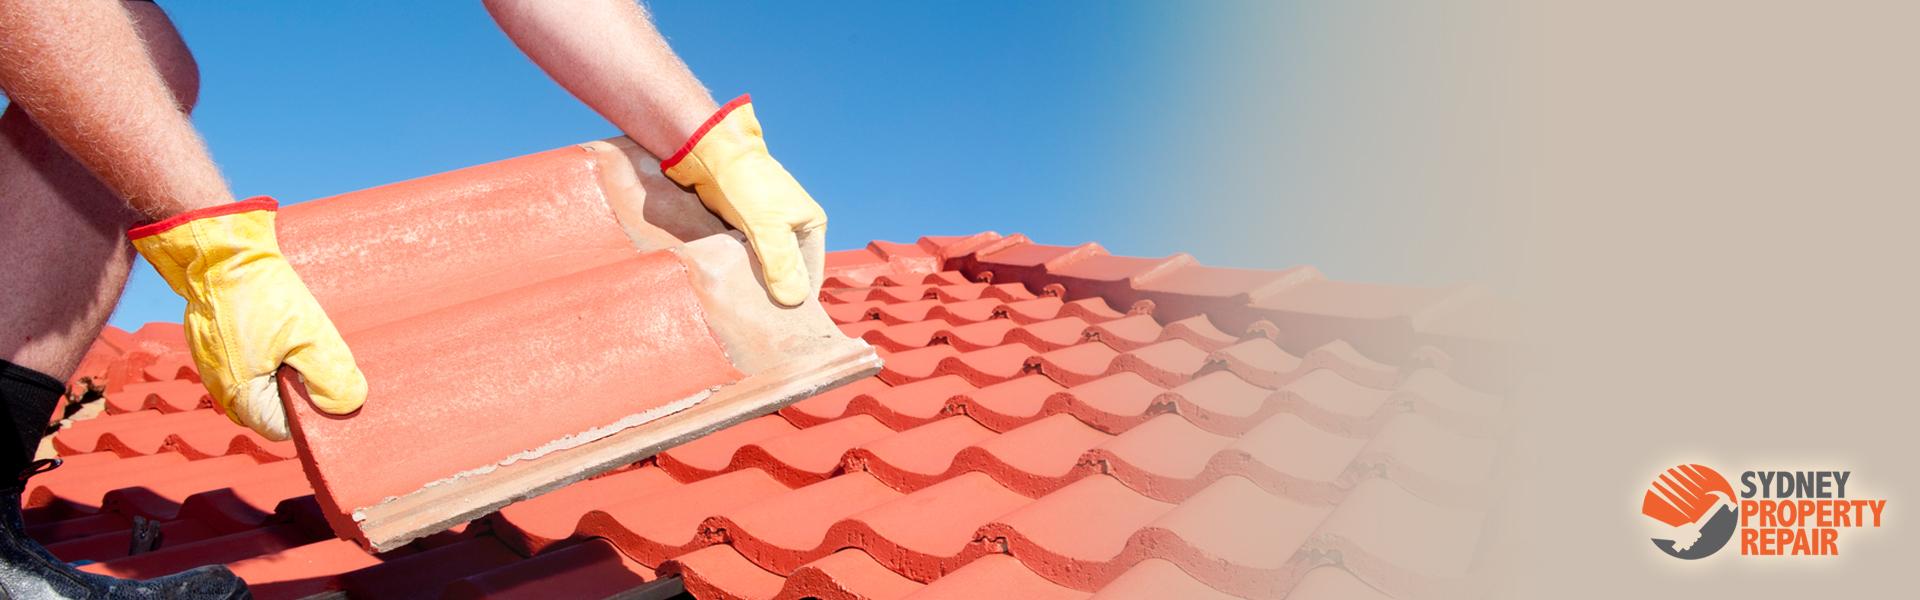 Roof Repairs Sydney Property Repairs